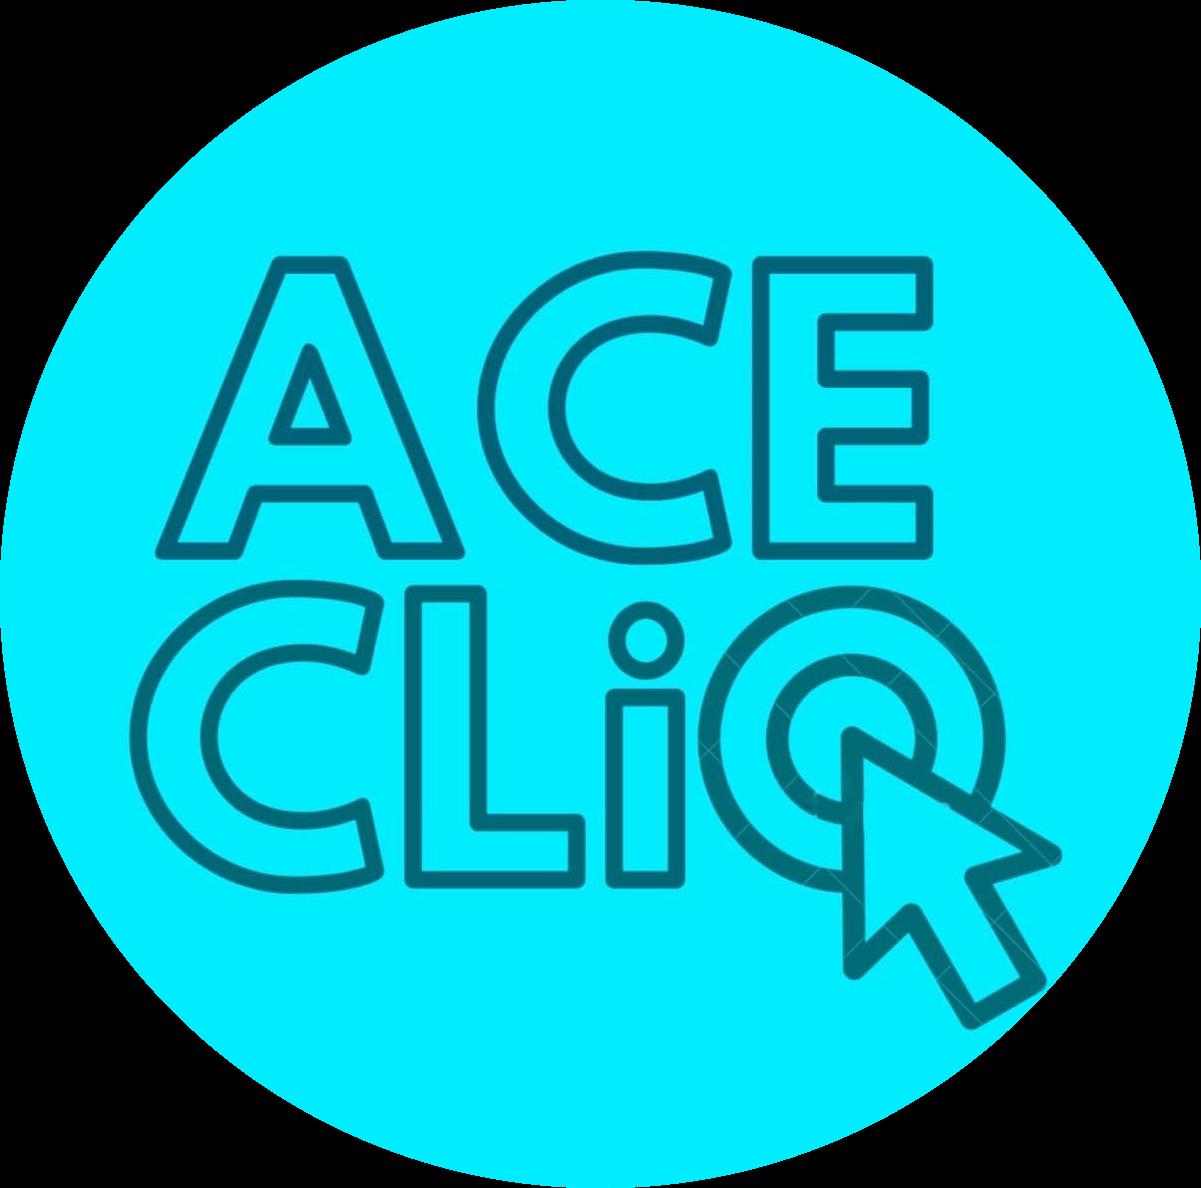 ACECLiQ